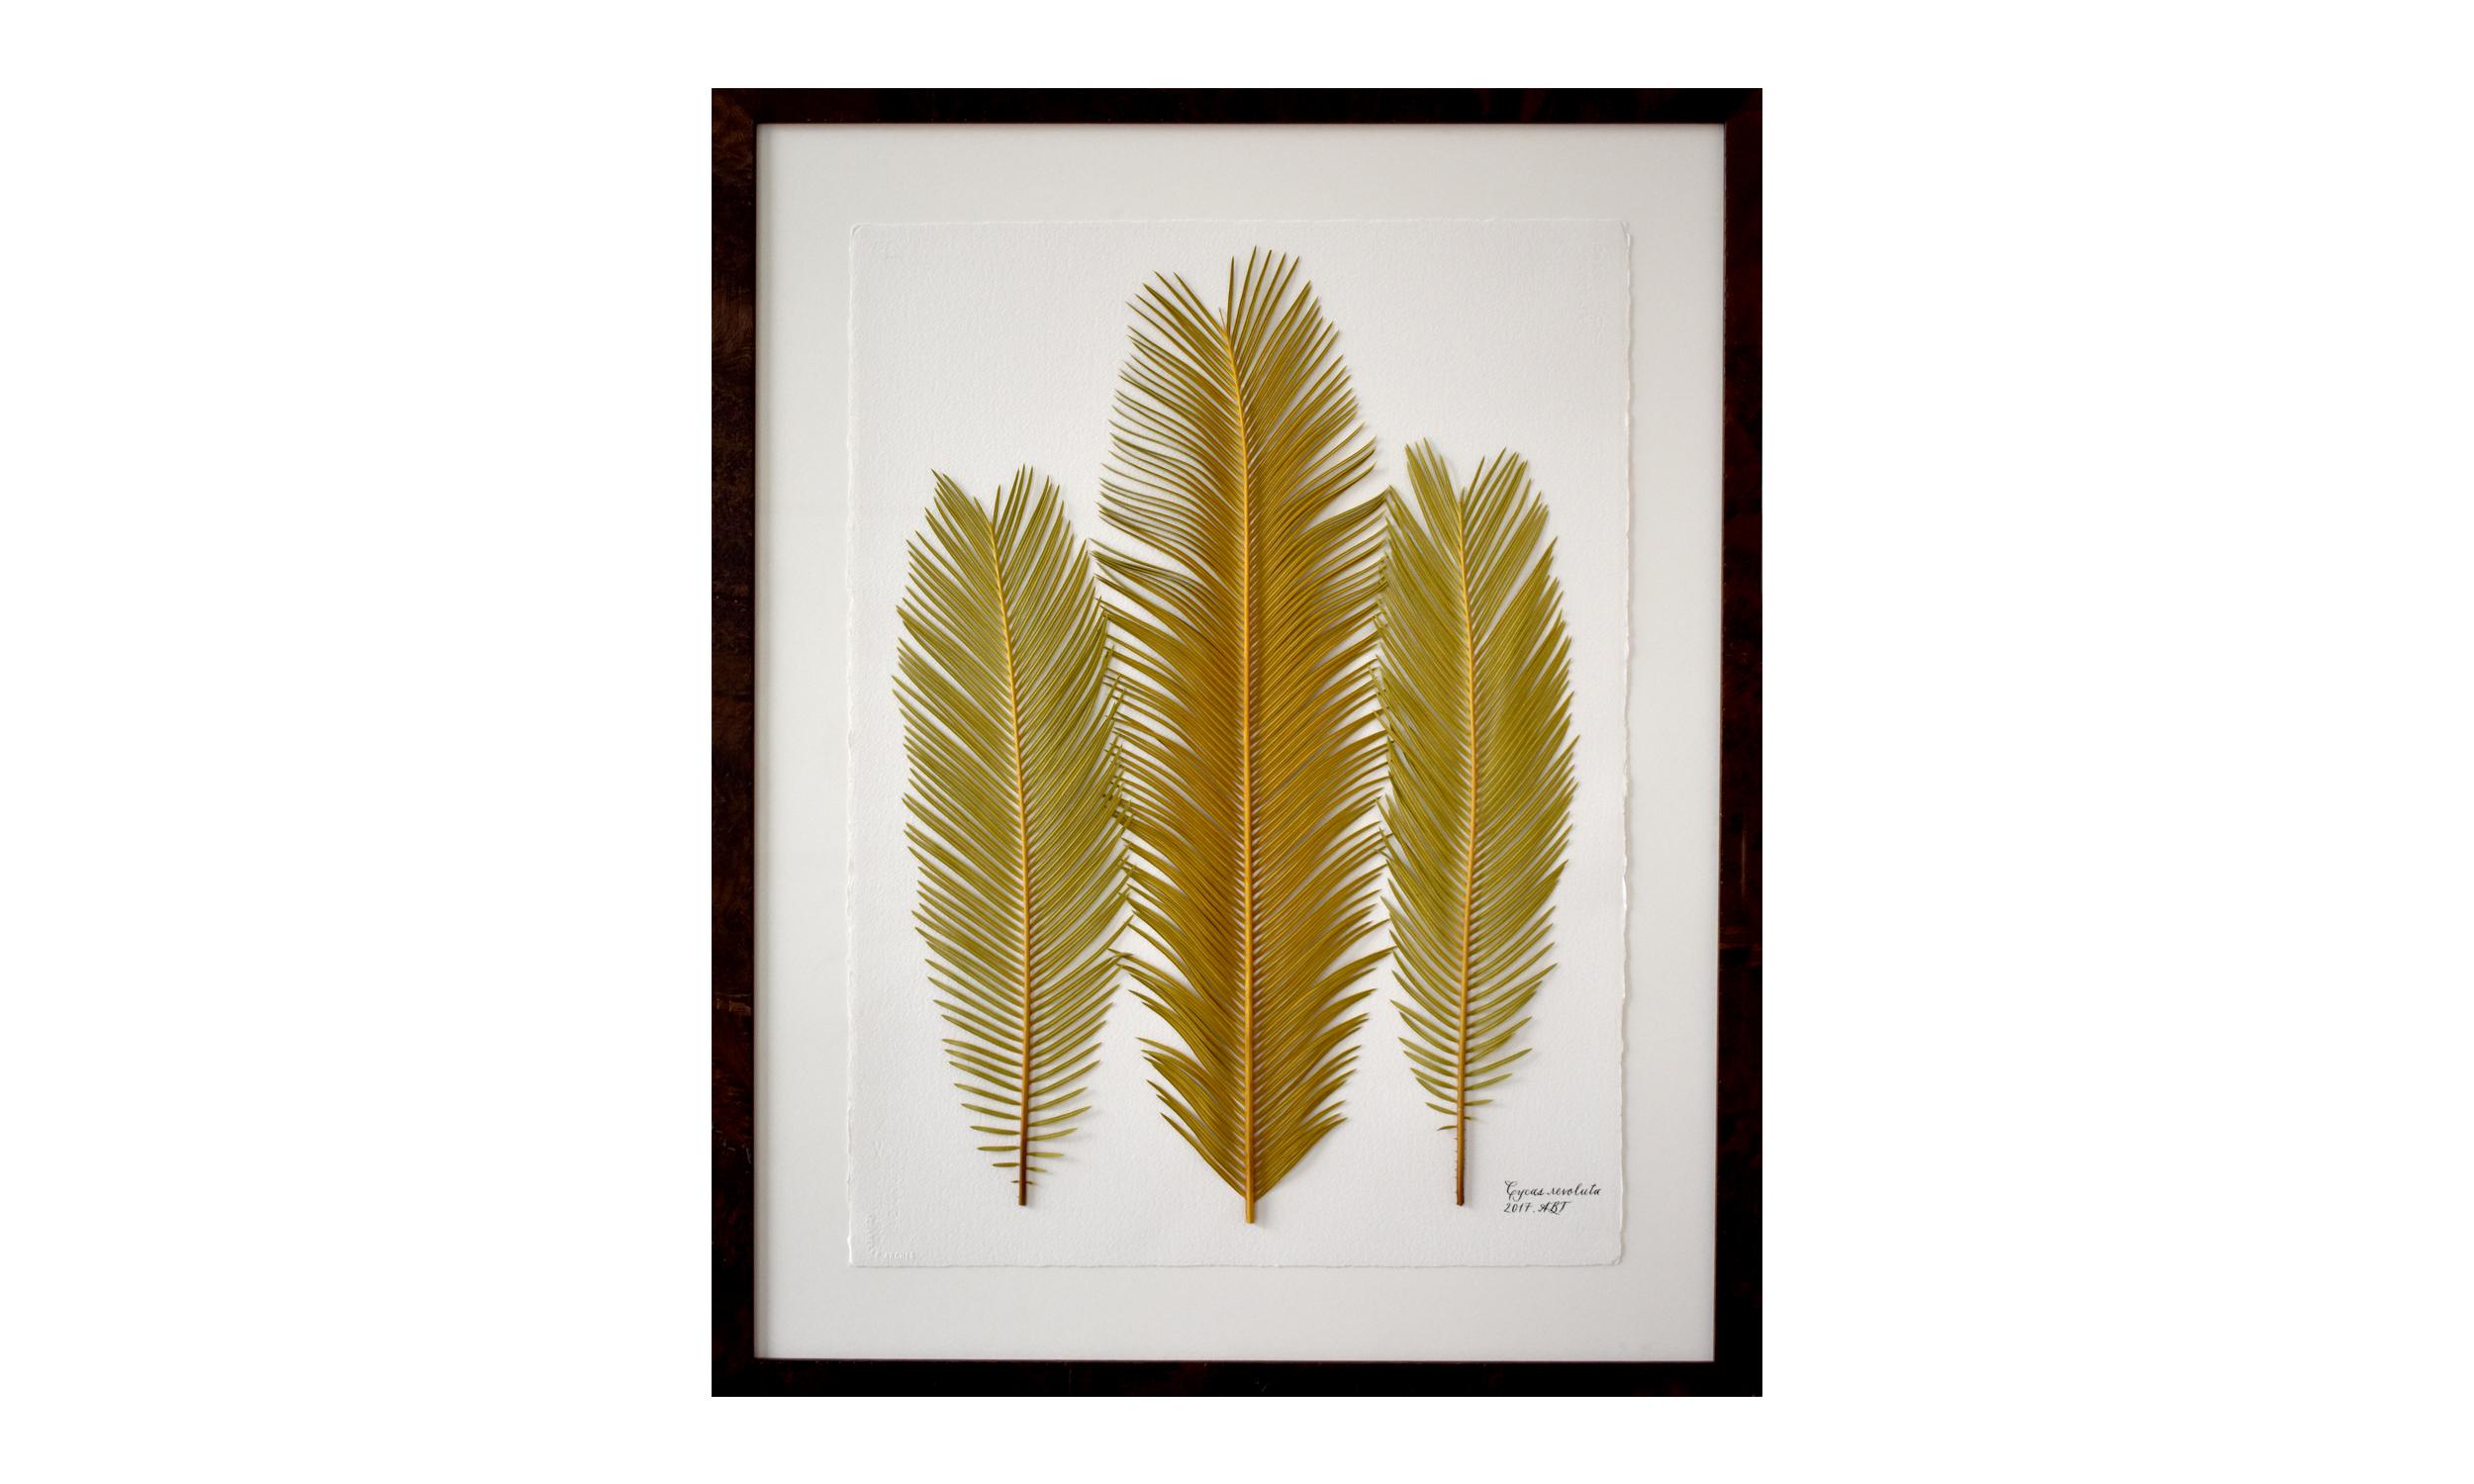 Cycas revoluta,  30.5 x 37.25 inches, $ 3,100 SOLD